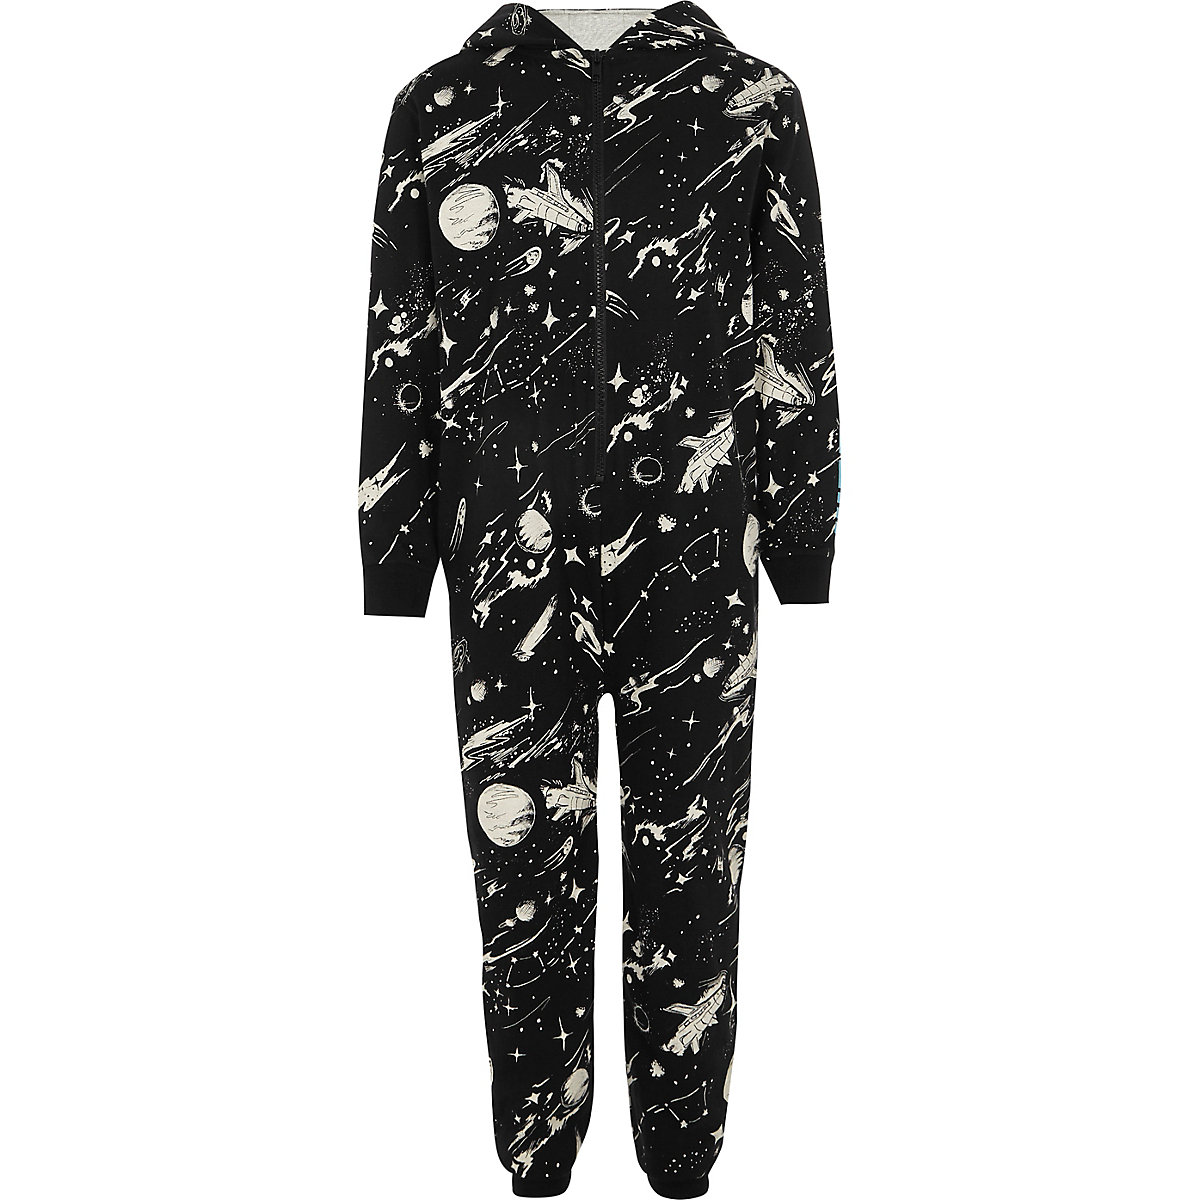 Boys black space theme print onesie